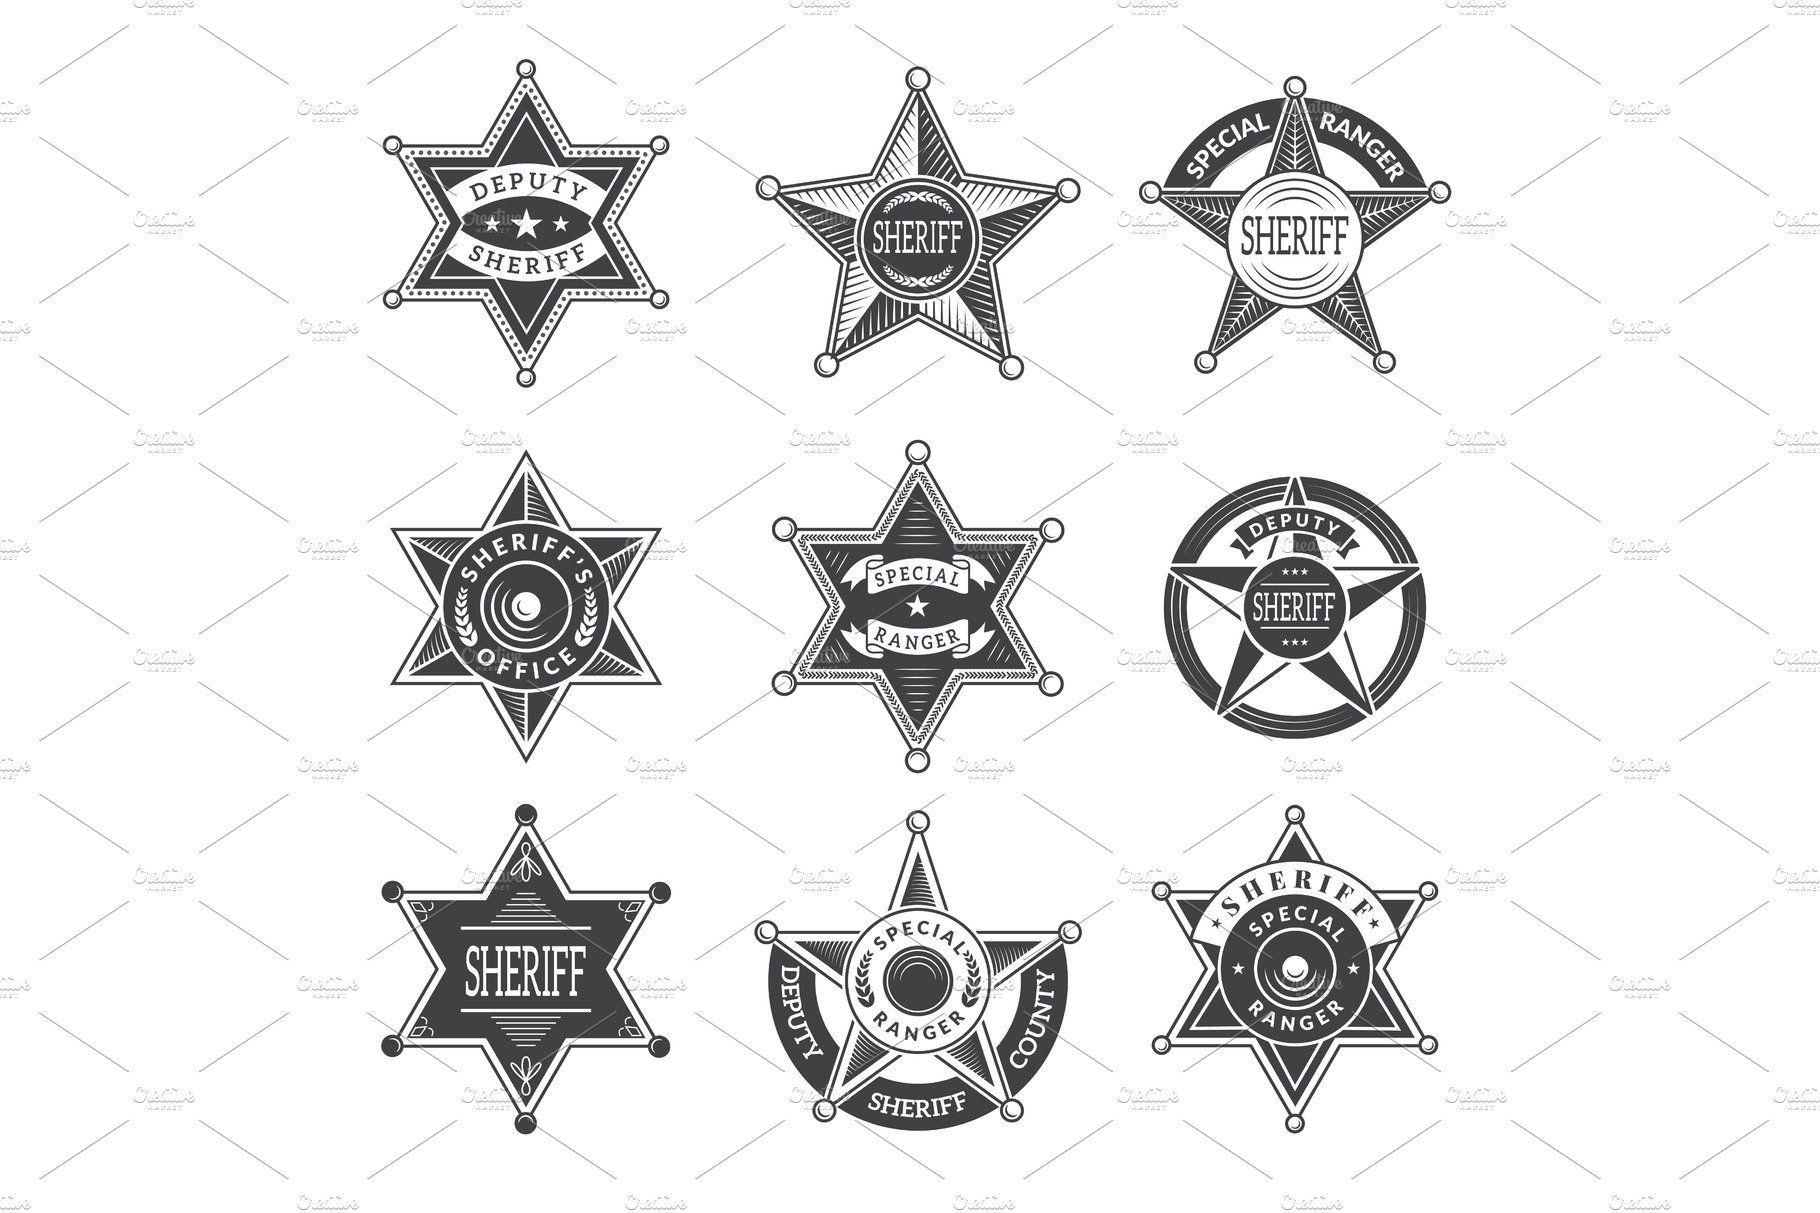 Sheriff stars badges. Western star by Onyx on.